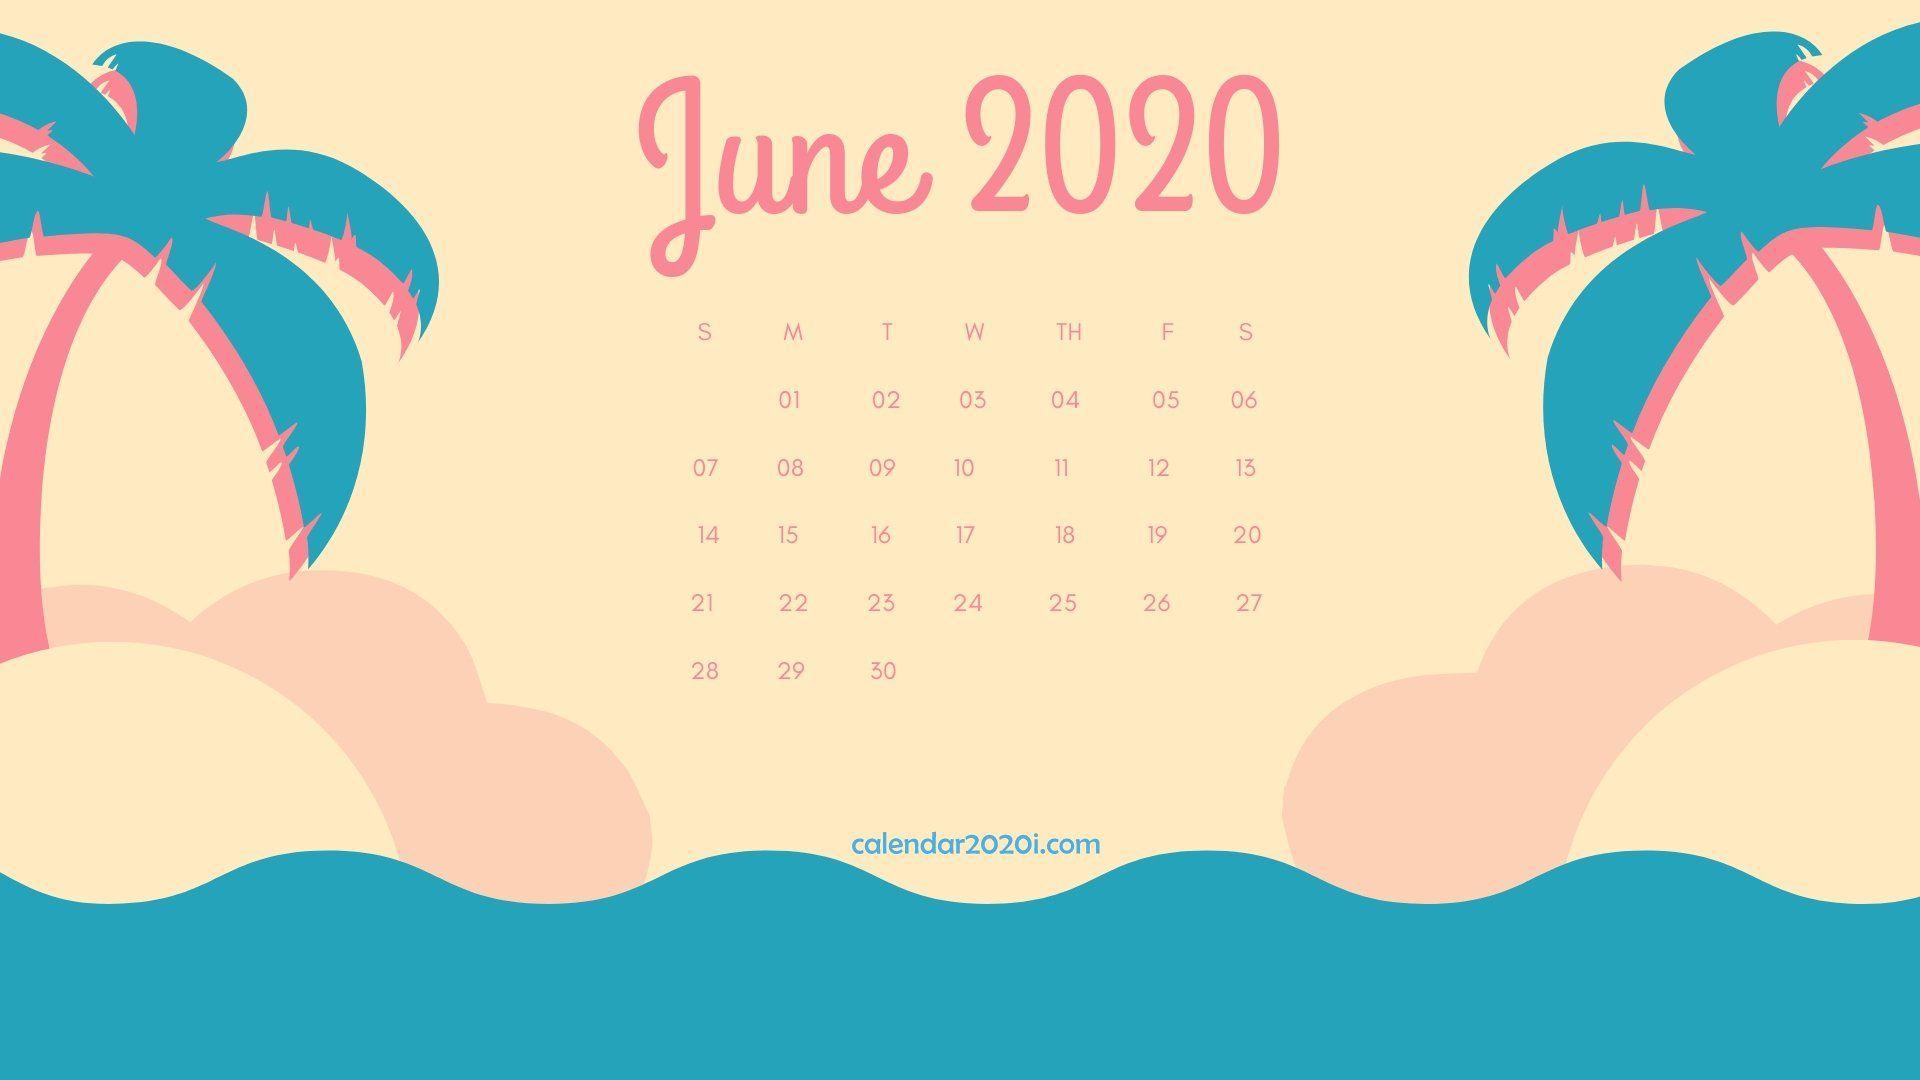 June 2020 Calendar Wallpapers   Top June 2020 Calendar 1920x1080